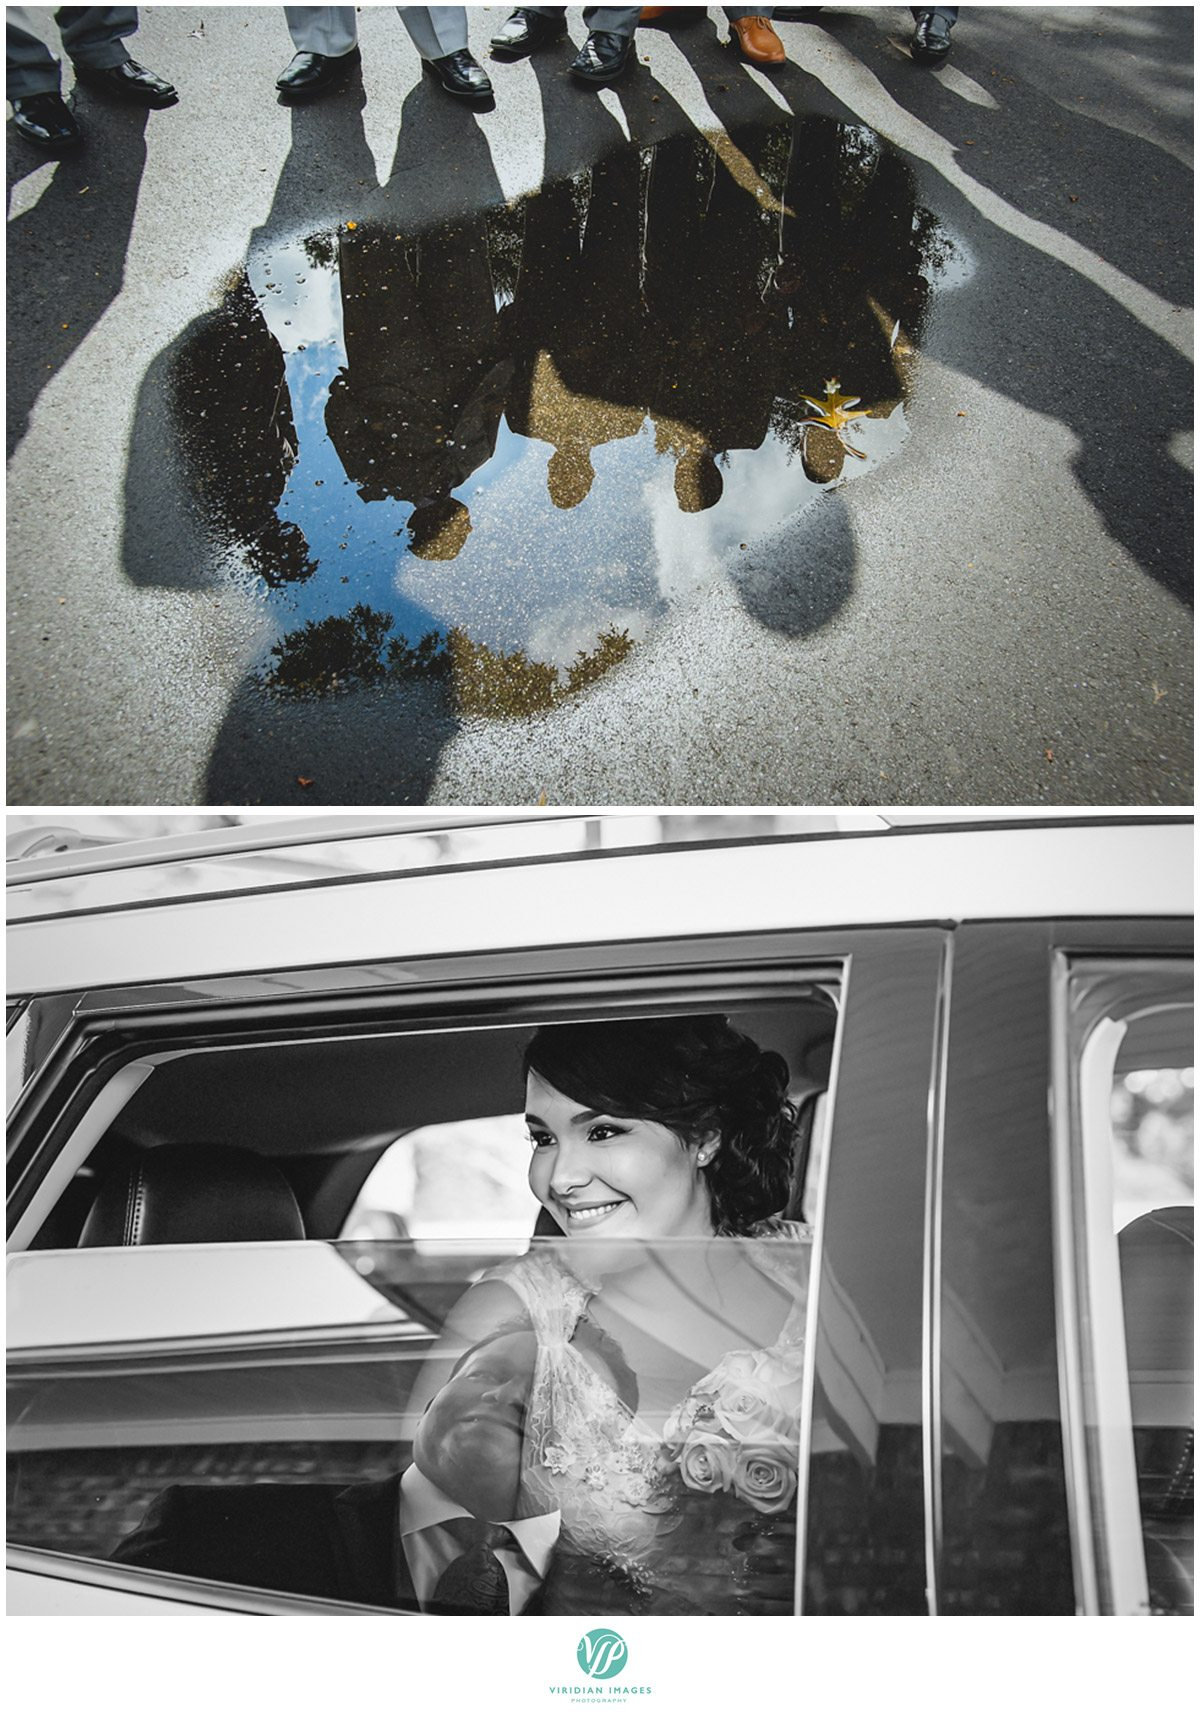 Hilton-Head-Callawassie-Island-Club-wedding-Viridian-Images-Photography-11.1